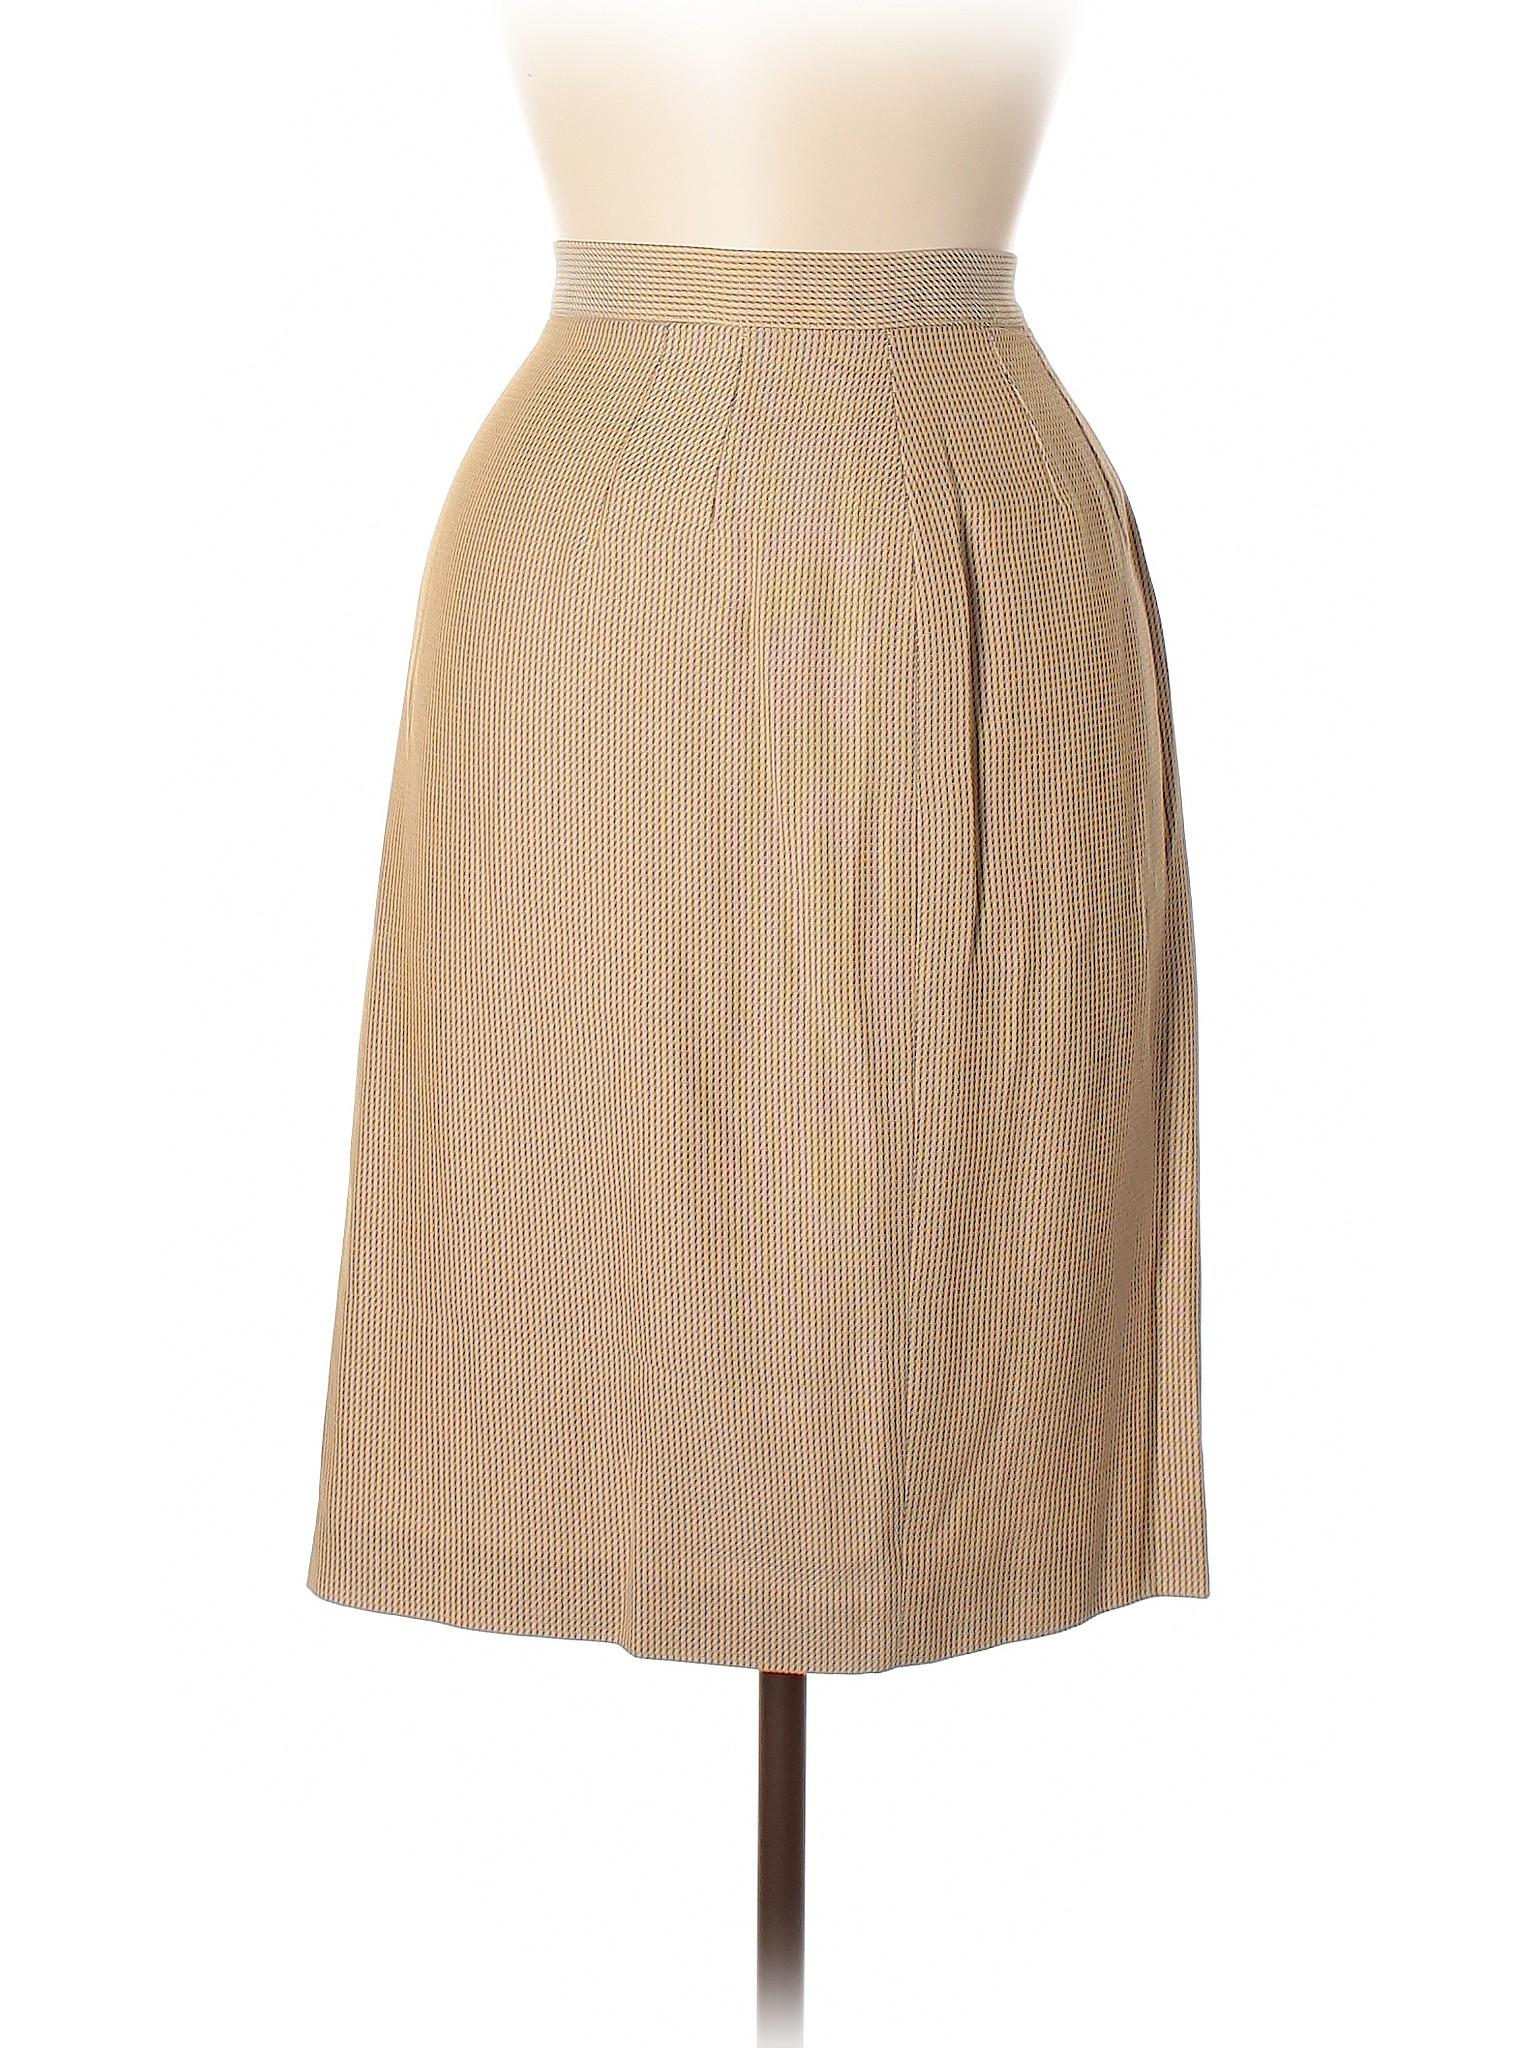 Skirt Casual Armani Giorgio Boutique Armani Giorgio Casual Boutique Skirt 8t7wqZq